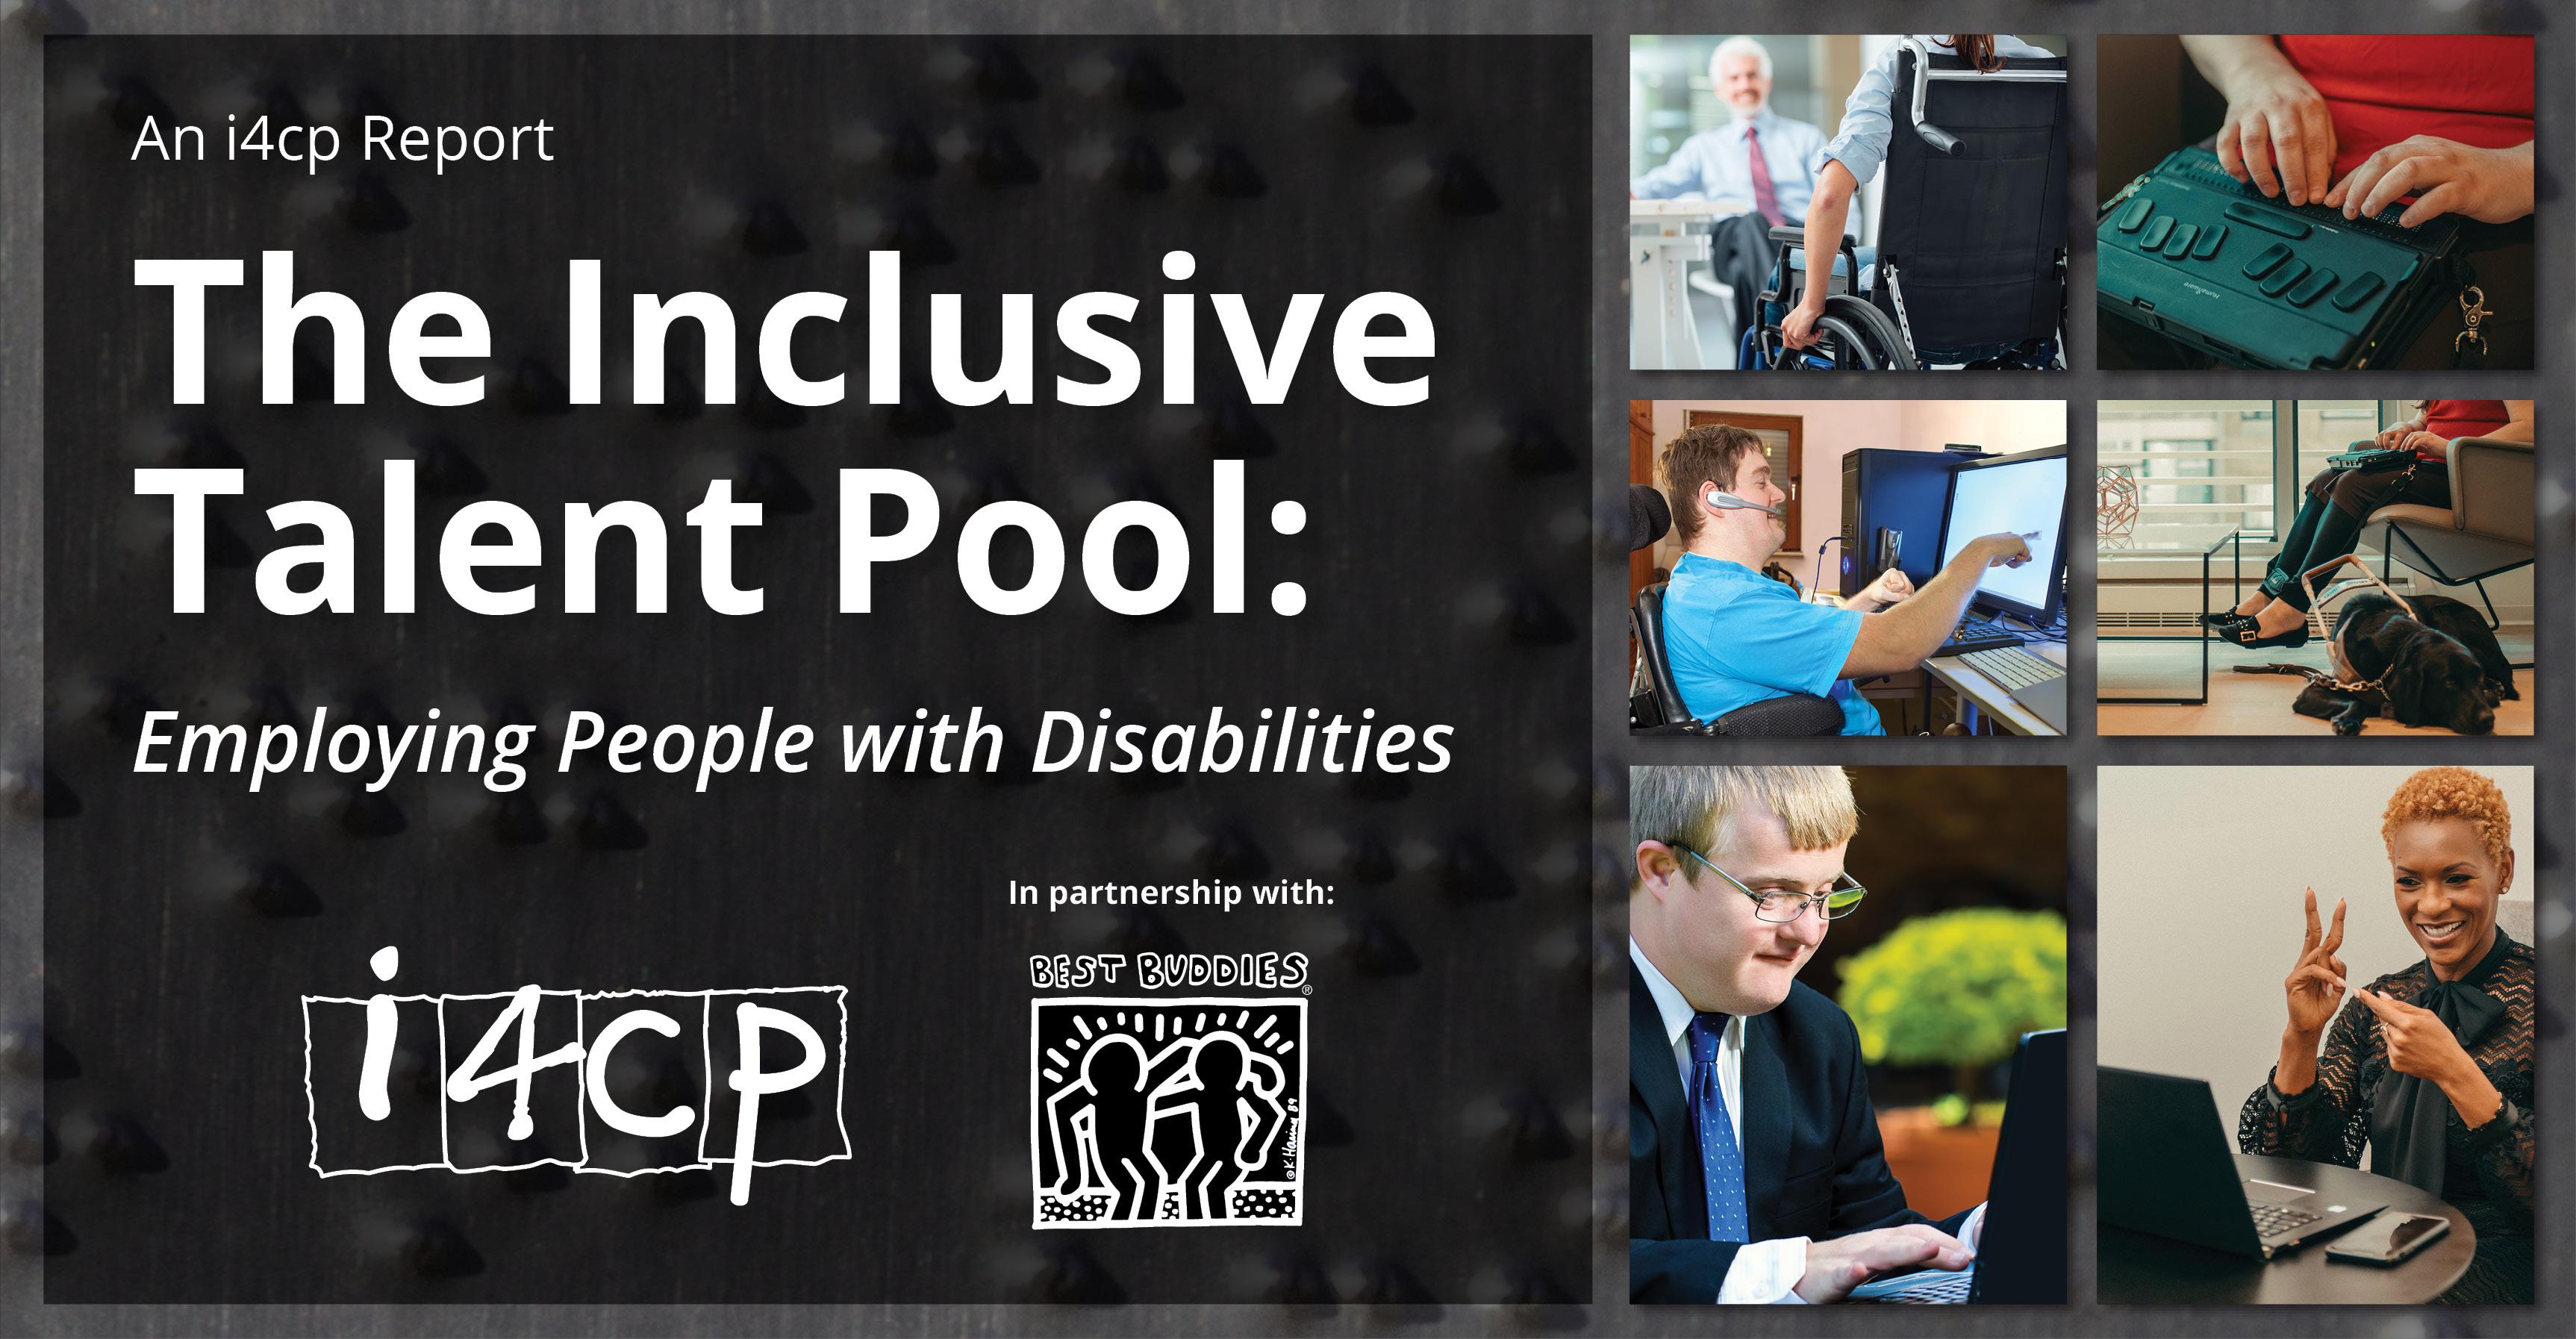 the inclusive talent pool hero.jpg